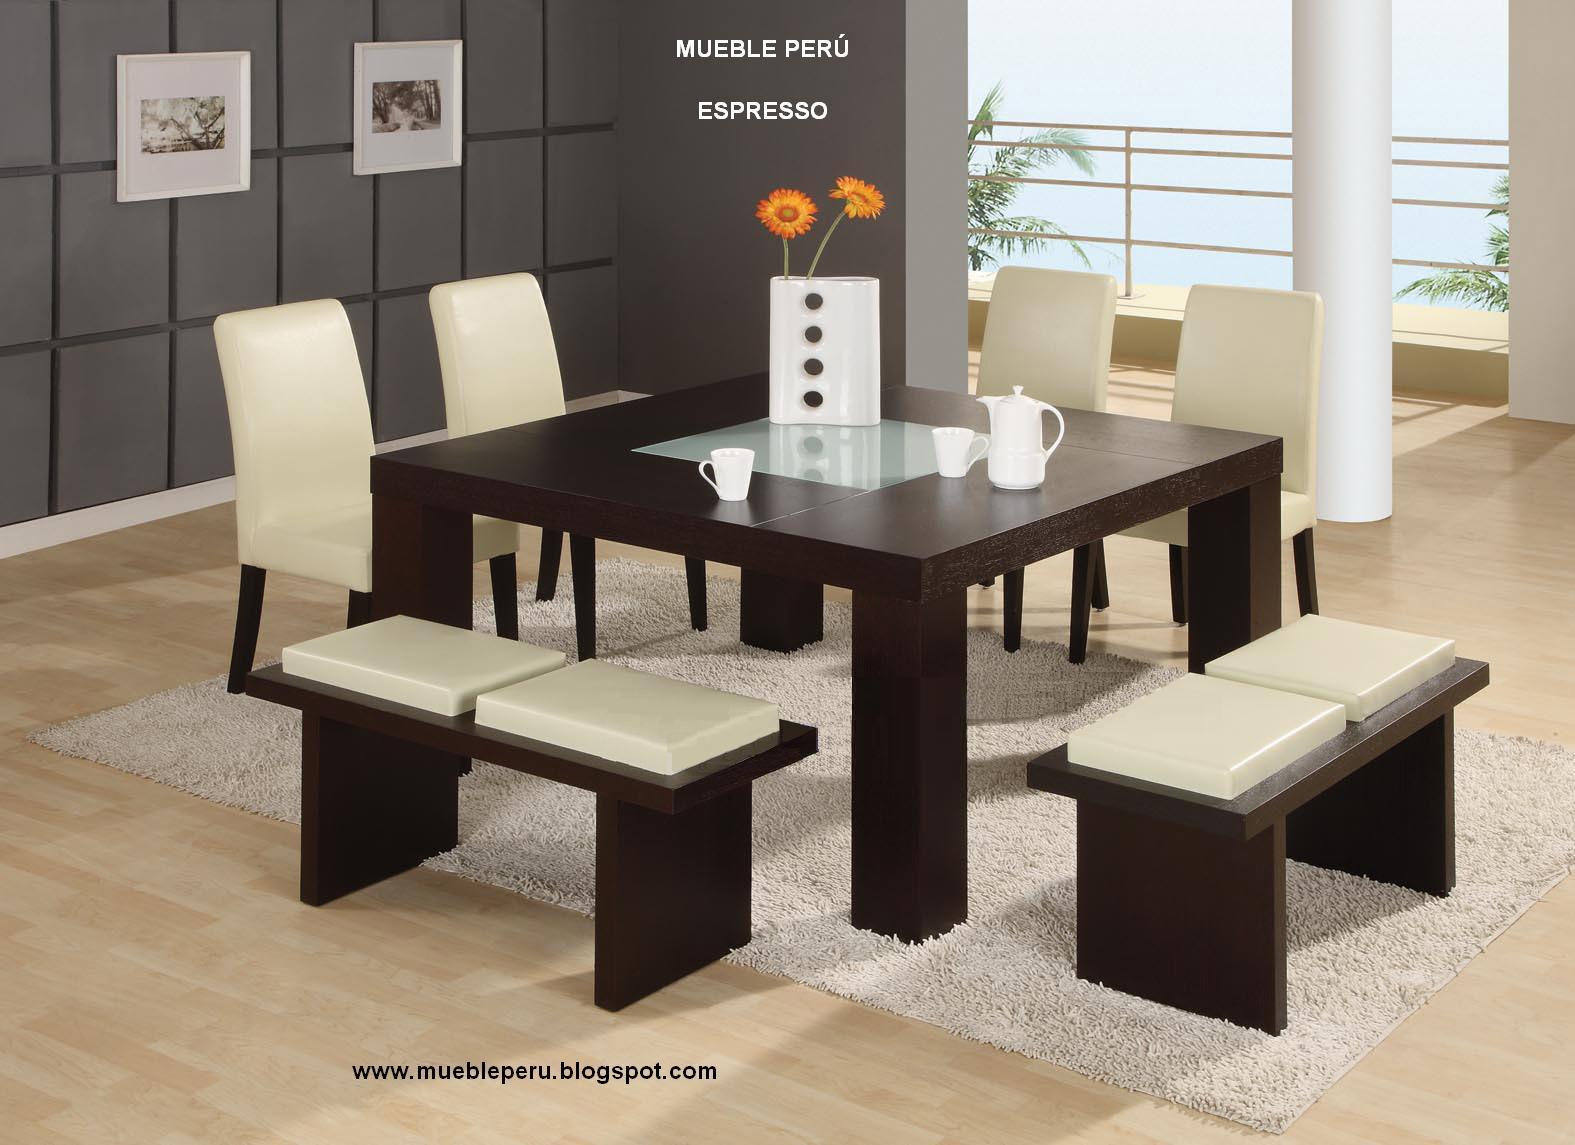 Muebles pegaso exclusivos y modernos comedores for Diseno comedores modernos